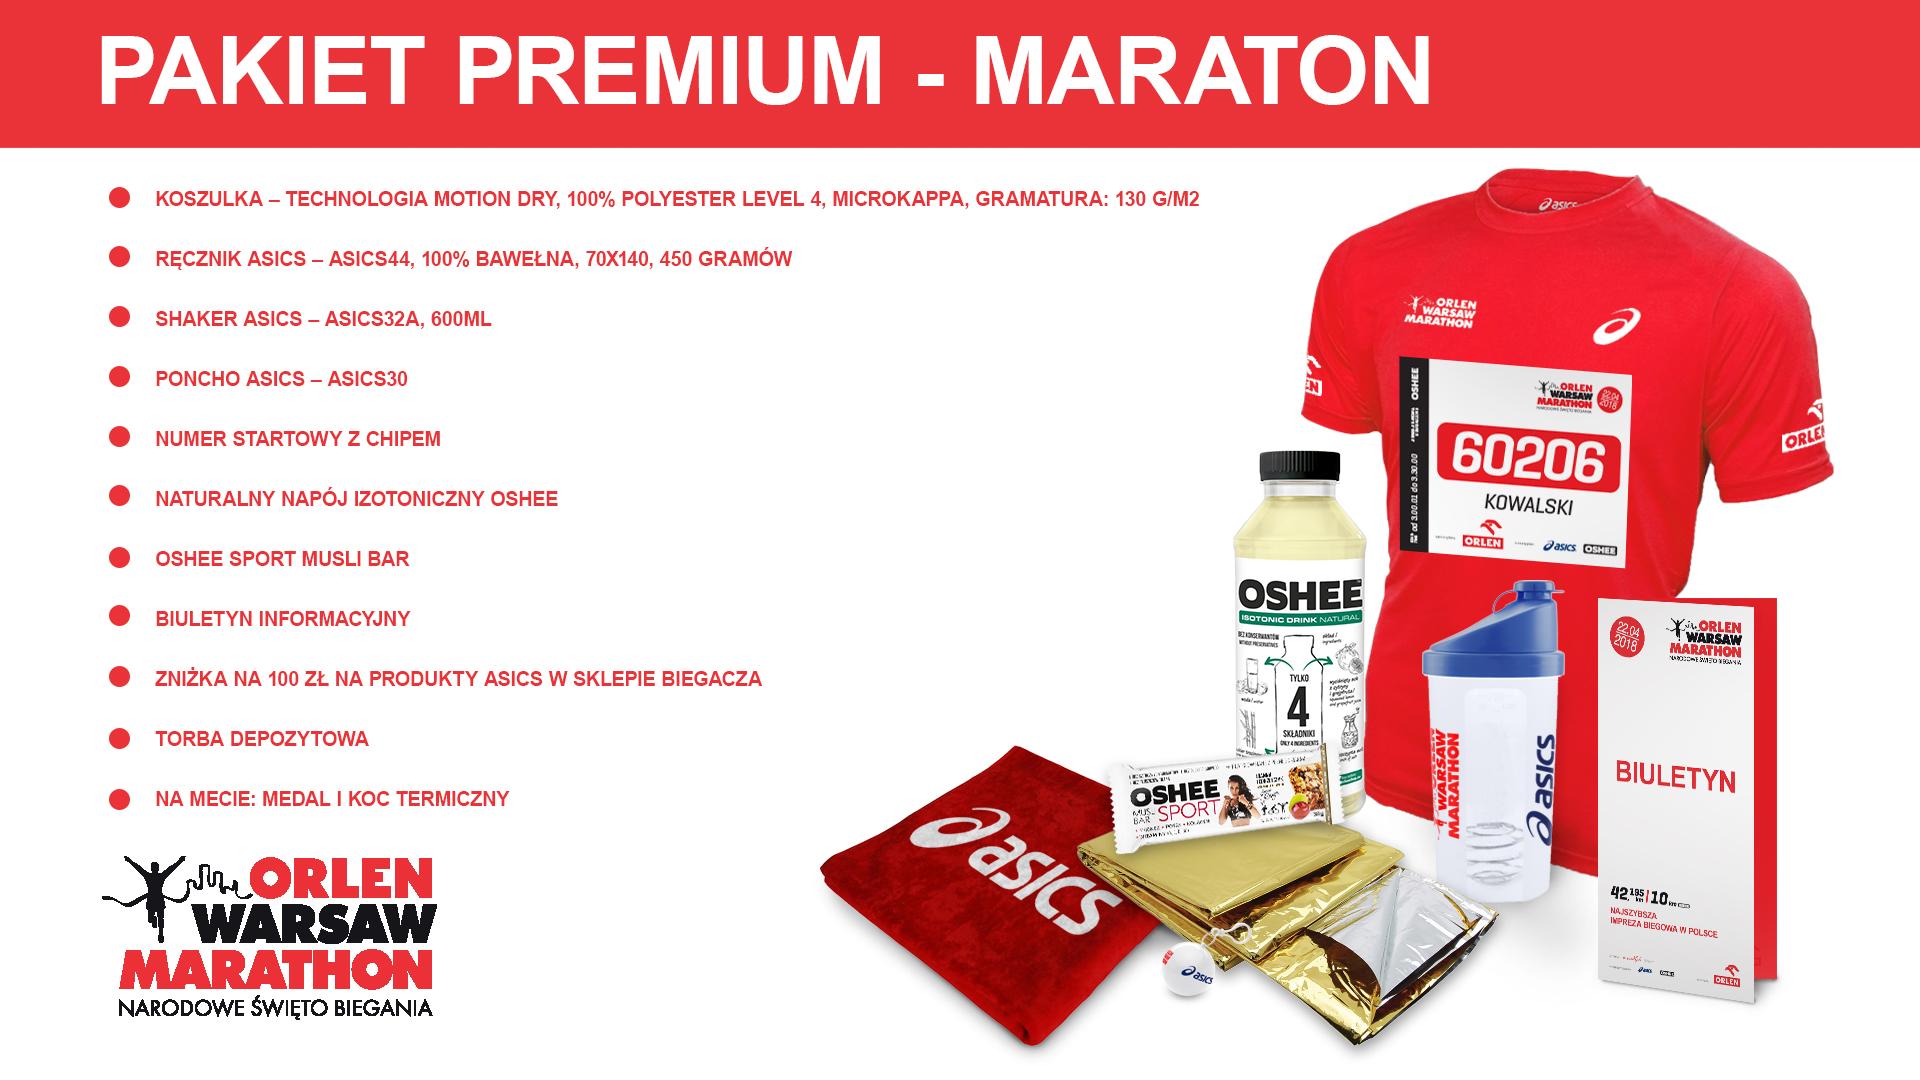 maraton_pakiet-premium